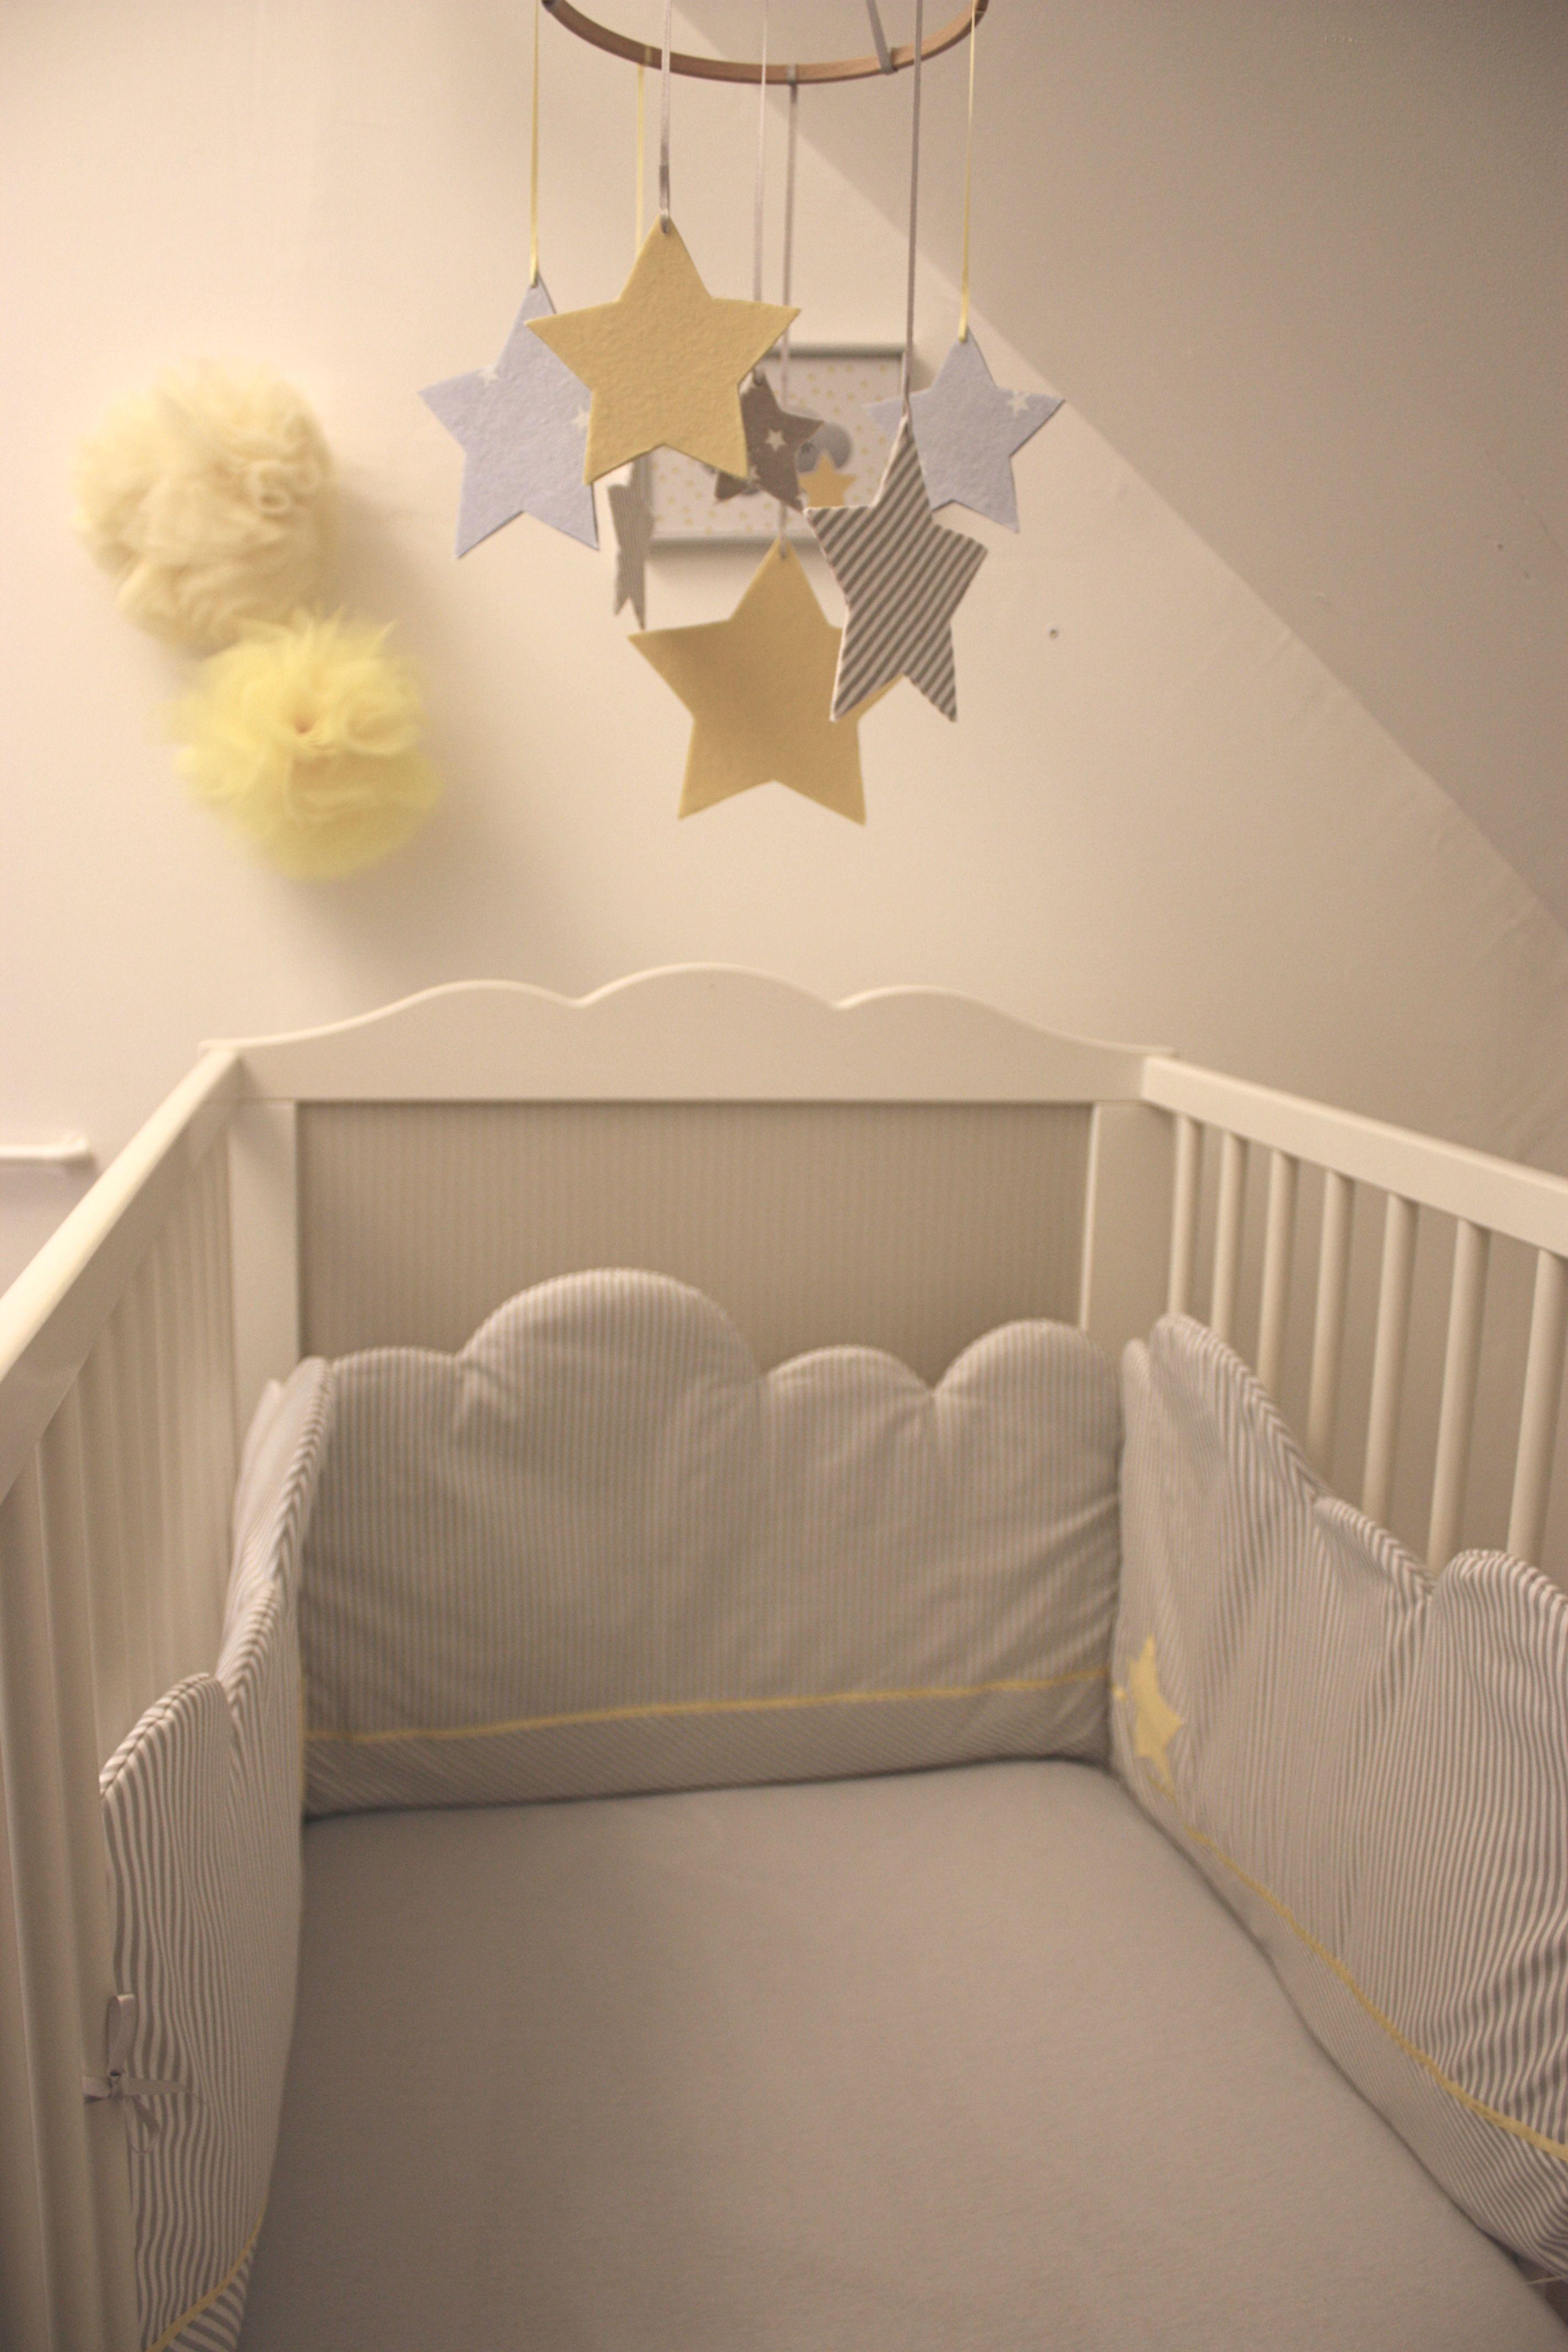 pour un futur bout de chou 1 for baby baby sewing. Black Bedroom Furniture Sets. Home Design Ideas